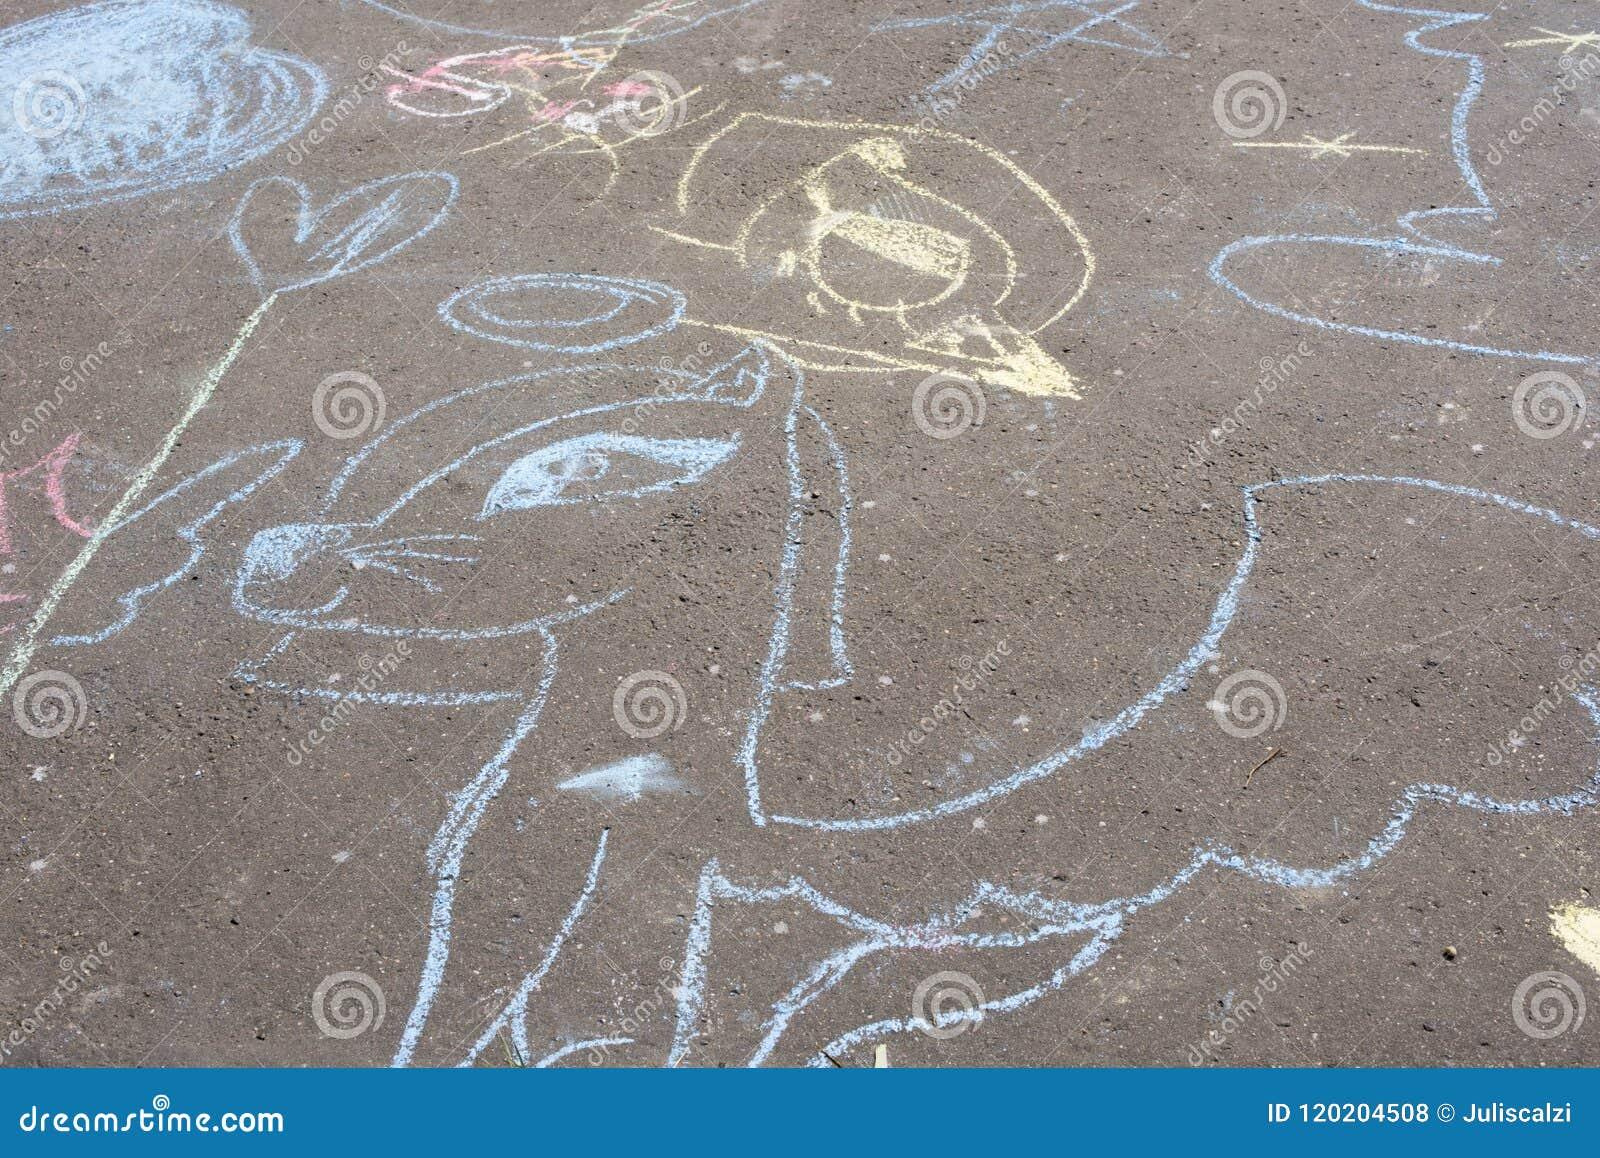 Children`s chalk drawings on ground